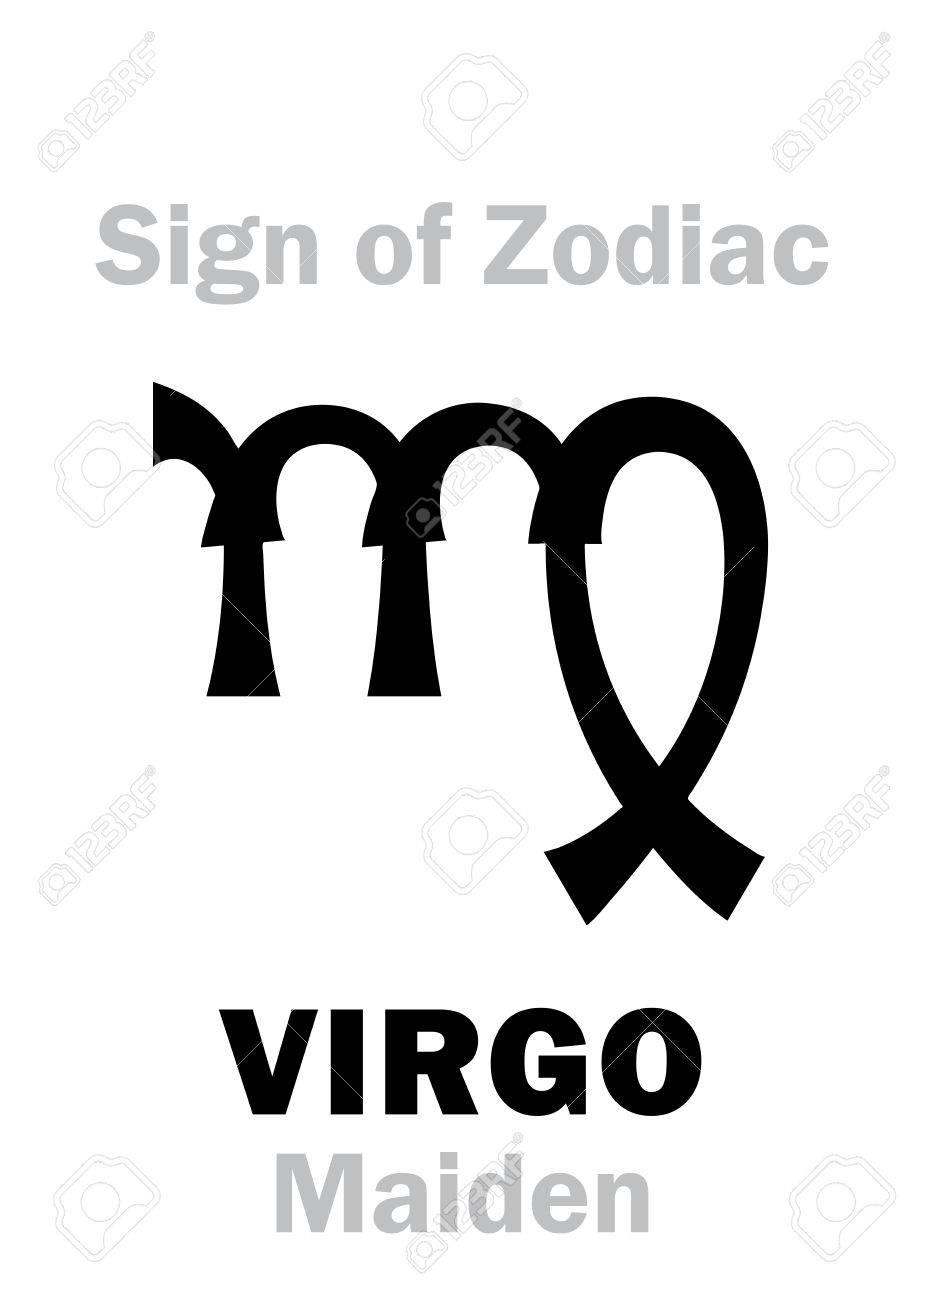 Astrology alphabet sign of zodiac virgo the maiden hieroglyphics astrology alphabet sign of zodiac virgo the maiden hieroglyphics character sign buycottarizona Gallery